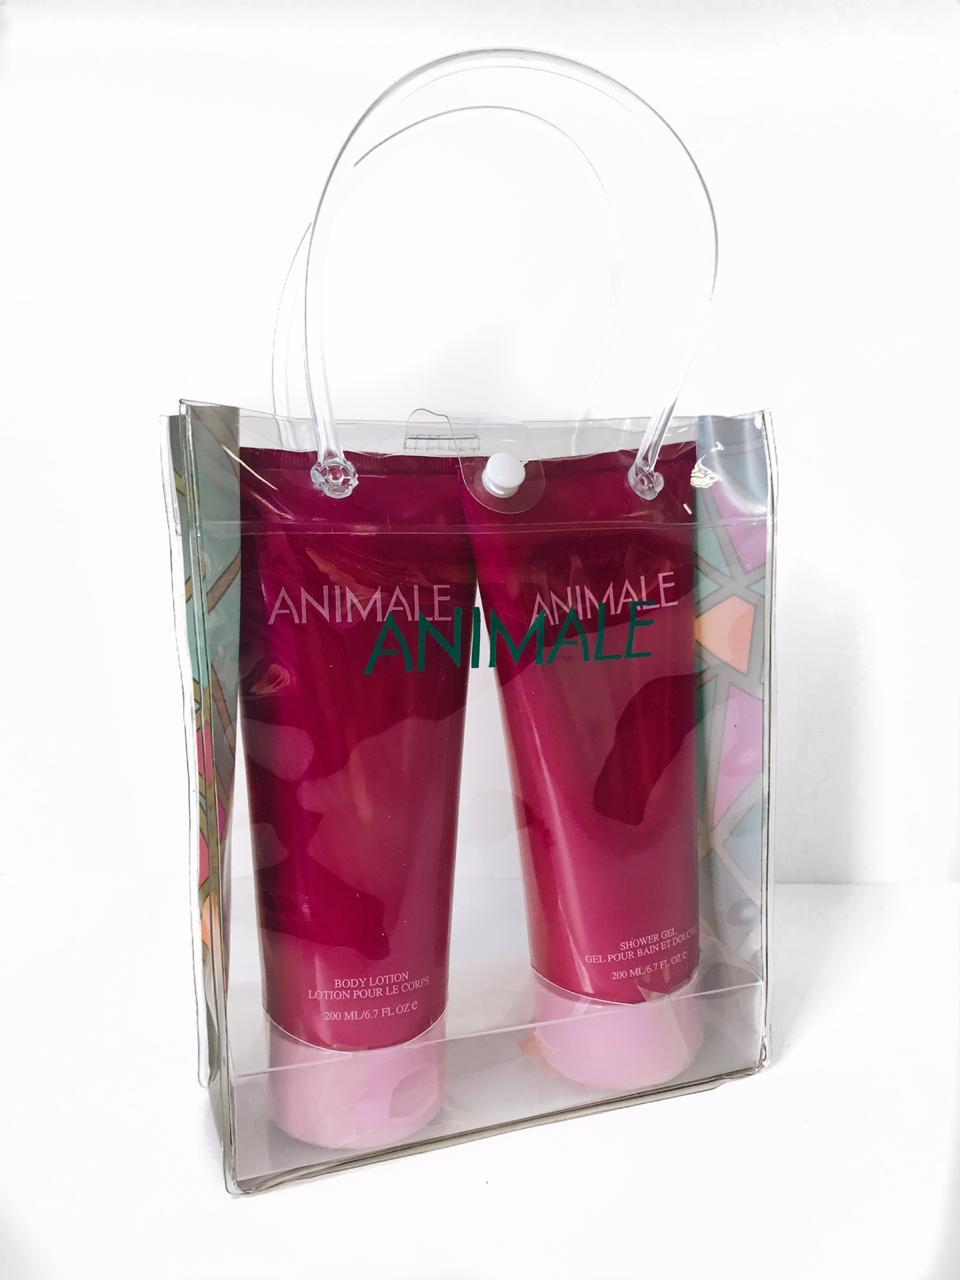 Kit Animale Feminino Body Lotion 200ml + Gel de Banho 200ml